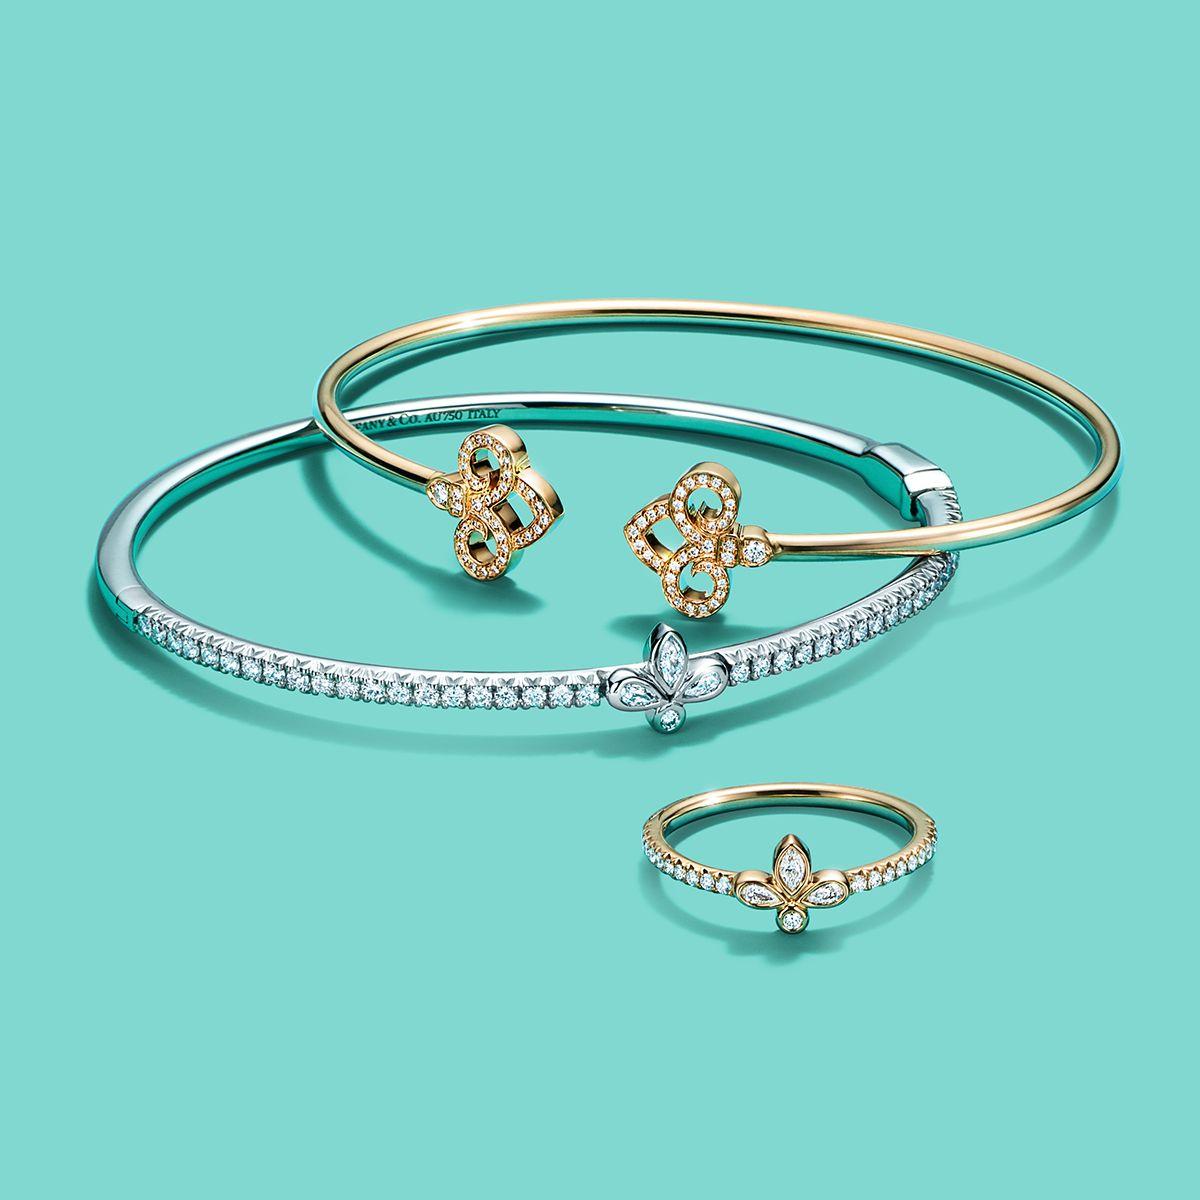 49c30f53563f9 Tiffany Fleur de Lis designs in 18k yellow and white gold. | Happy ...